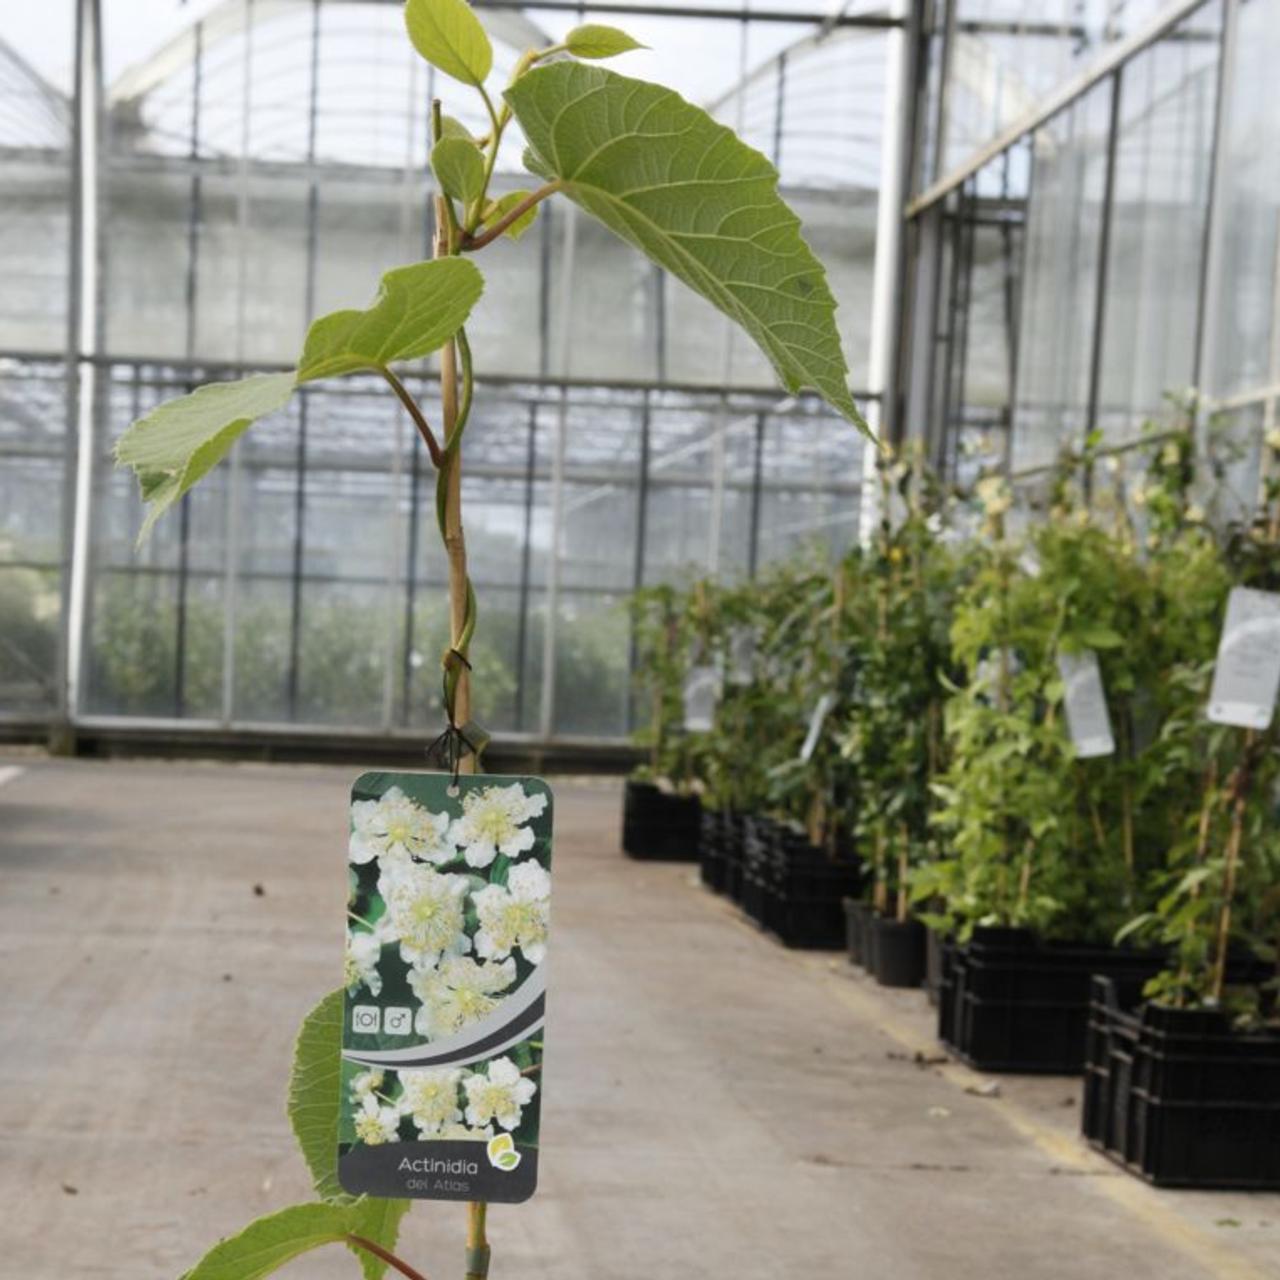 Actinidia deliciosa 'Atlas' plant